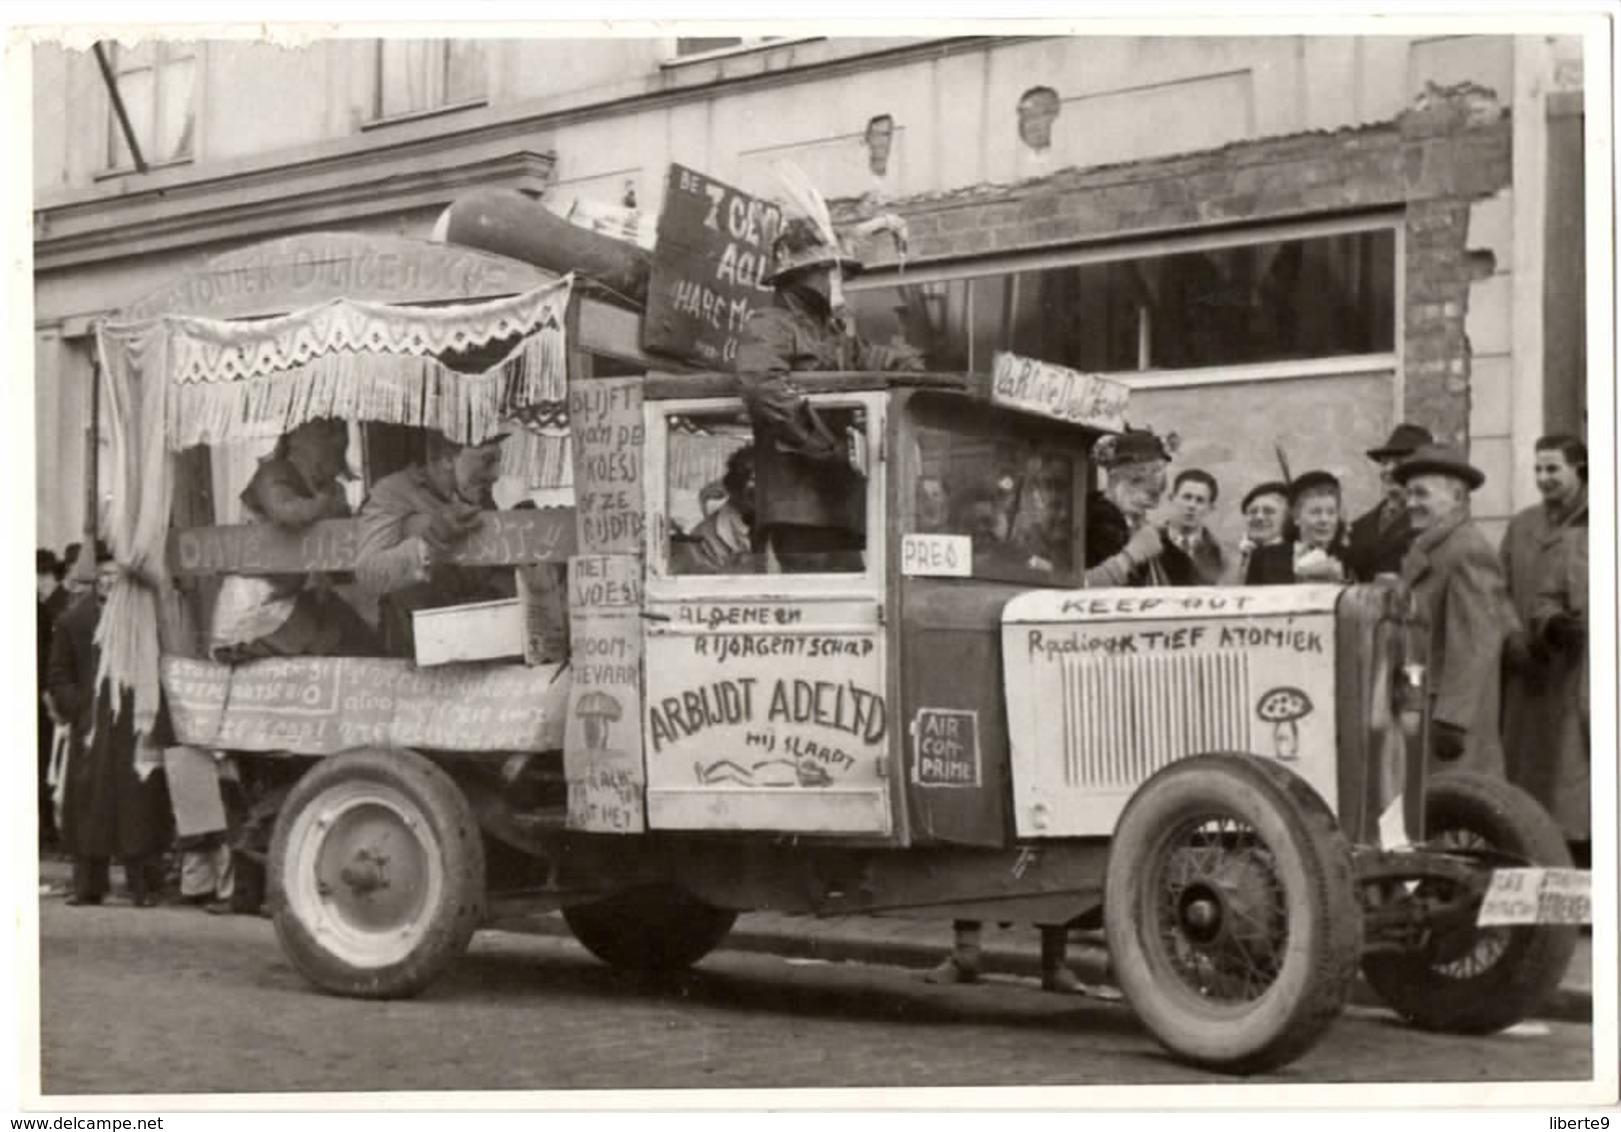 Camion 1953 Carnaval Aalst Alost  - Photo C.86 X 124mm Belgique - Automobiles